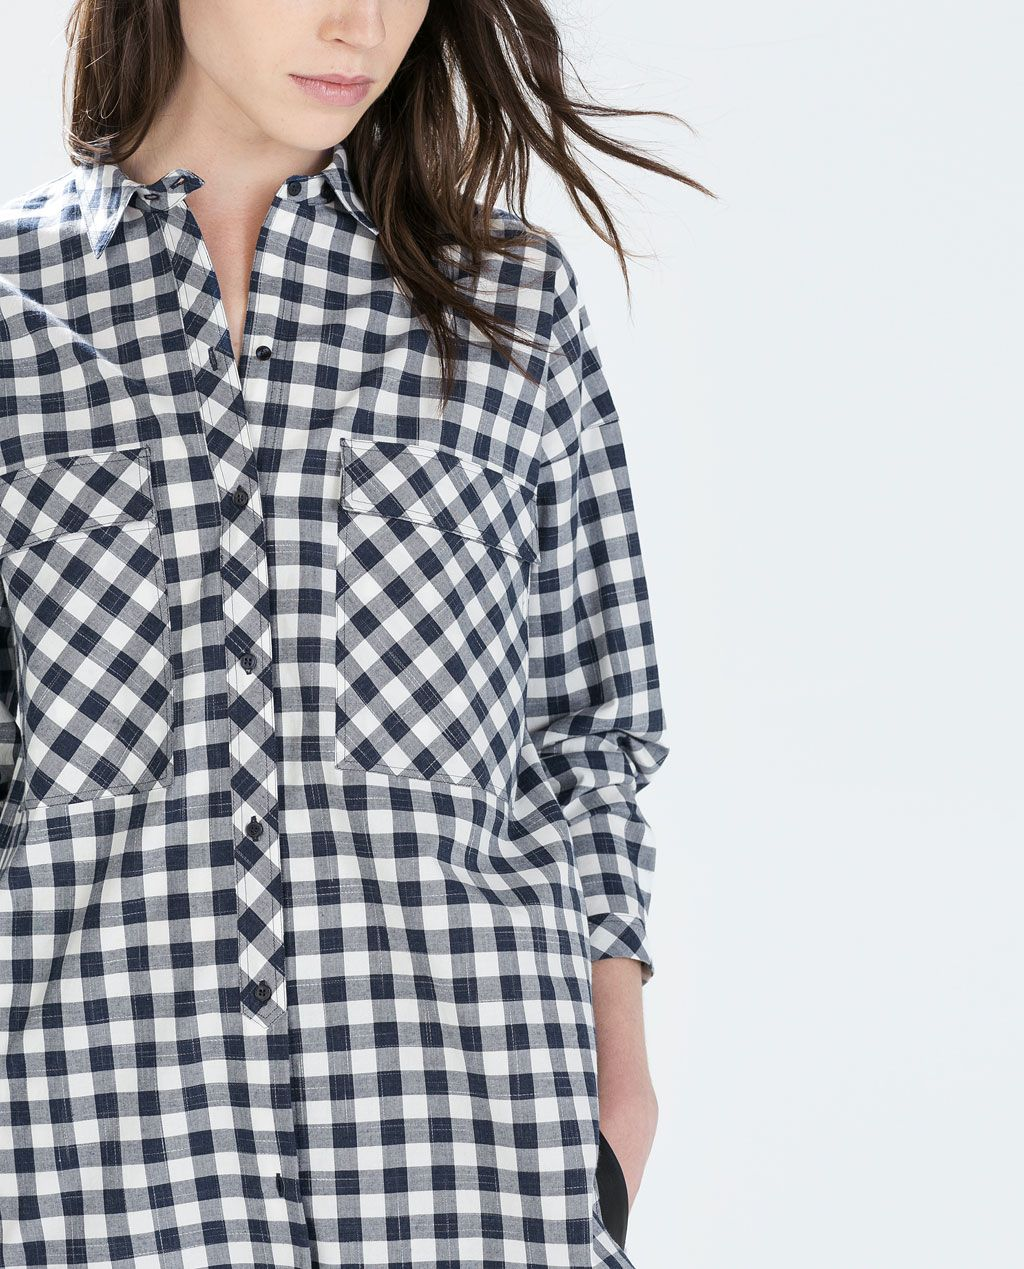 Camisas Zara Cuadros OversizeWishlist Camisa Mujer Nw8nm0v